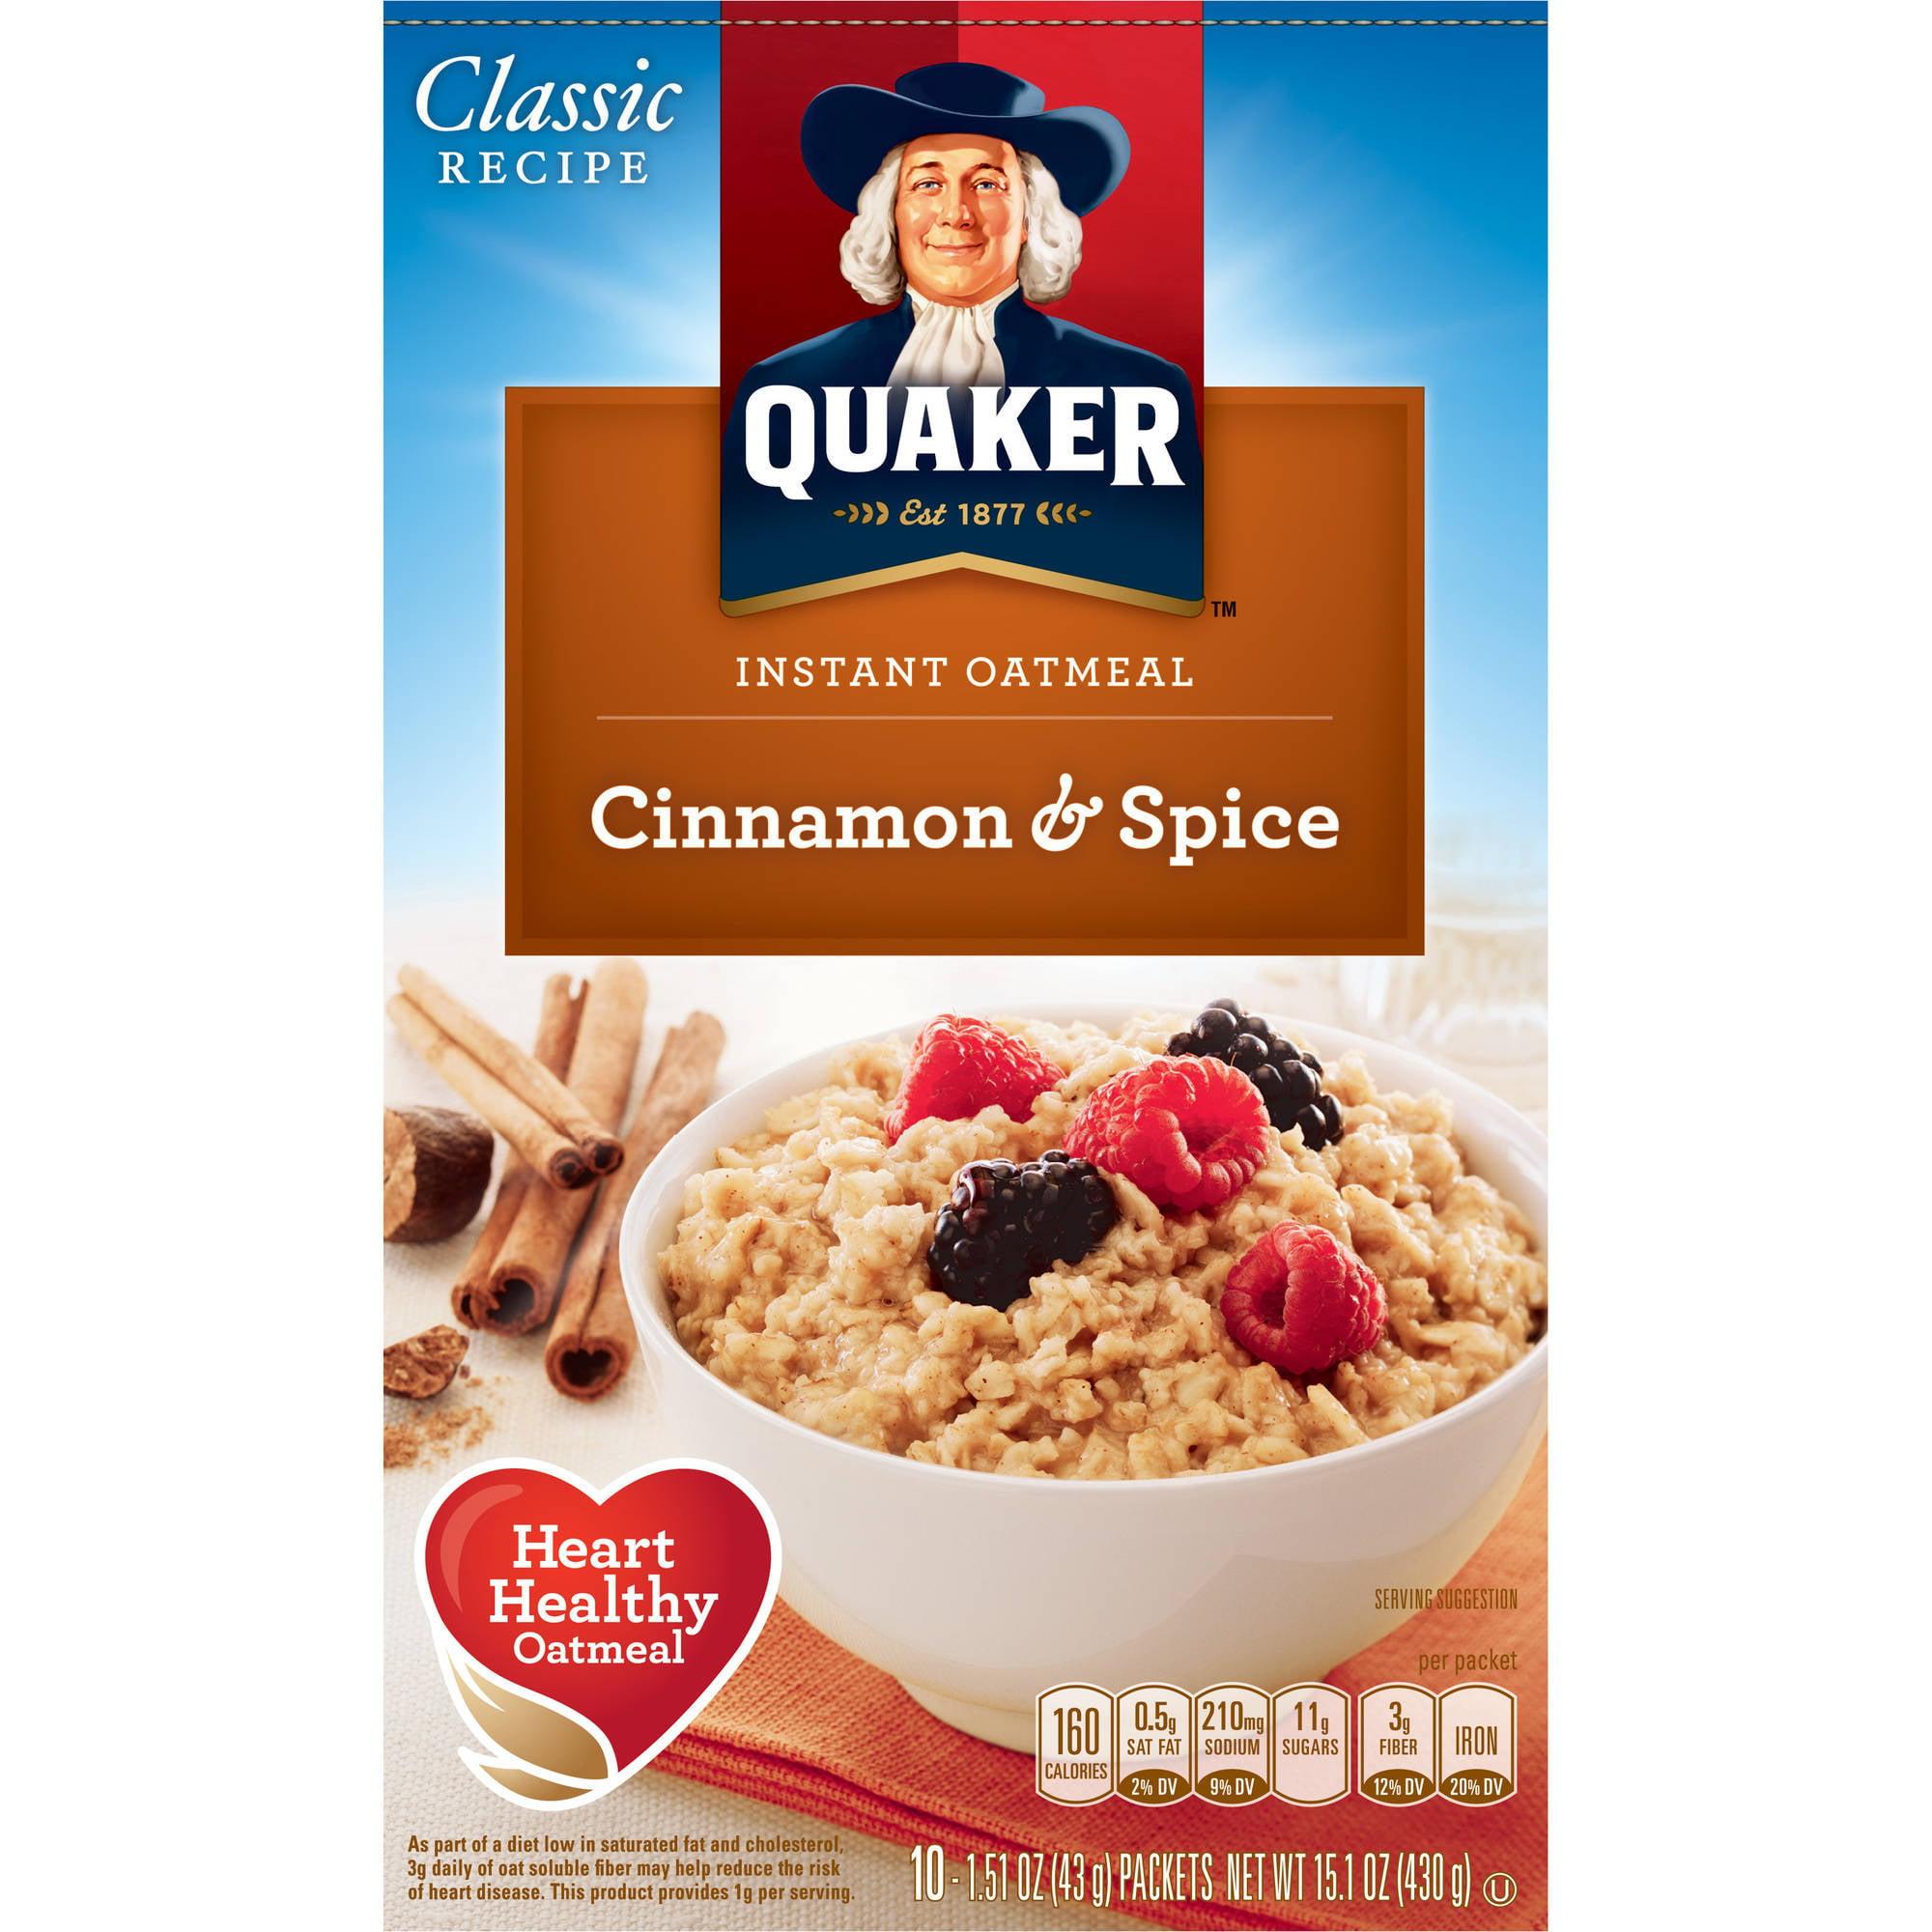 Quaker Cinnamon & Spice Instant Oatmeal, 10 ct